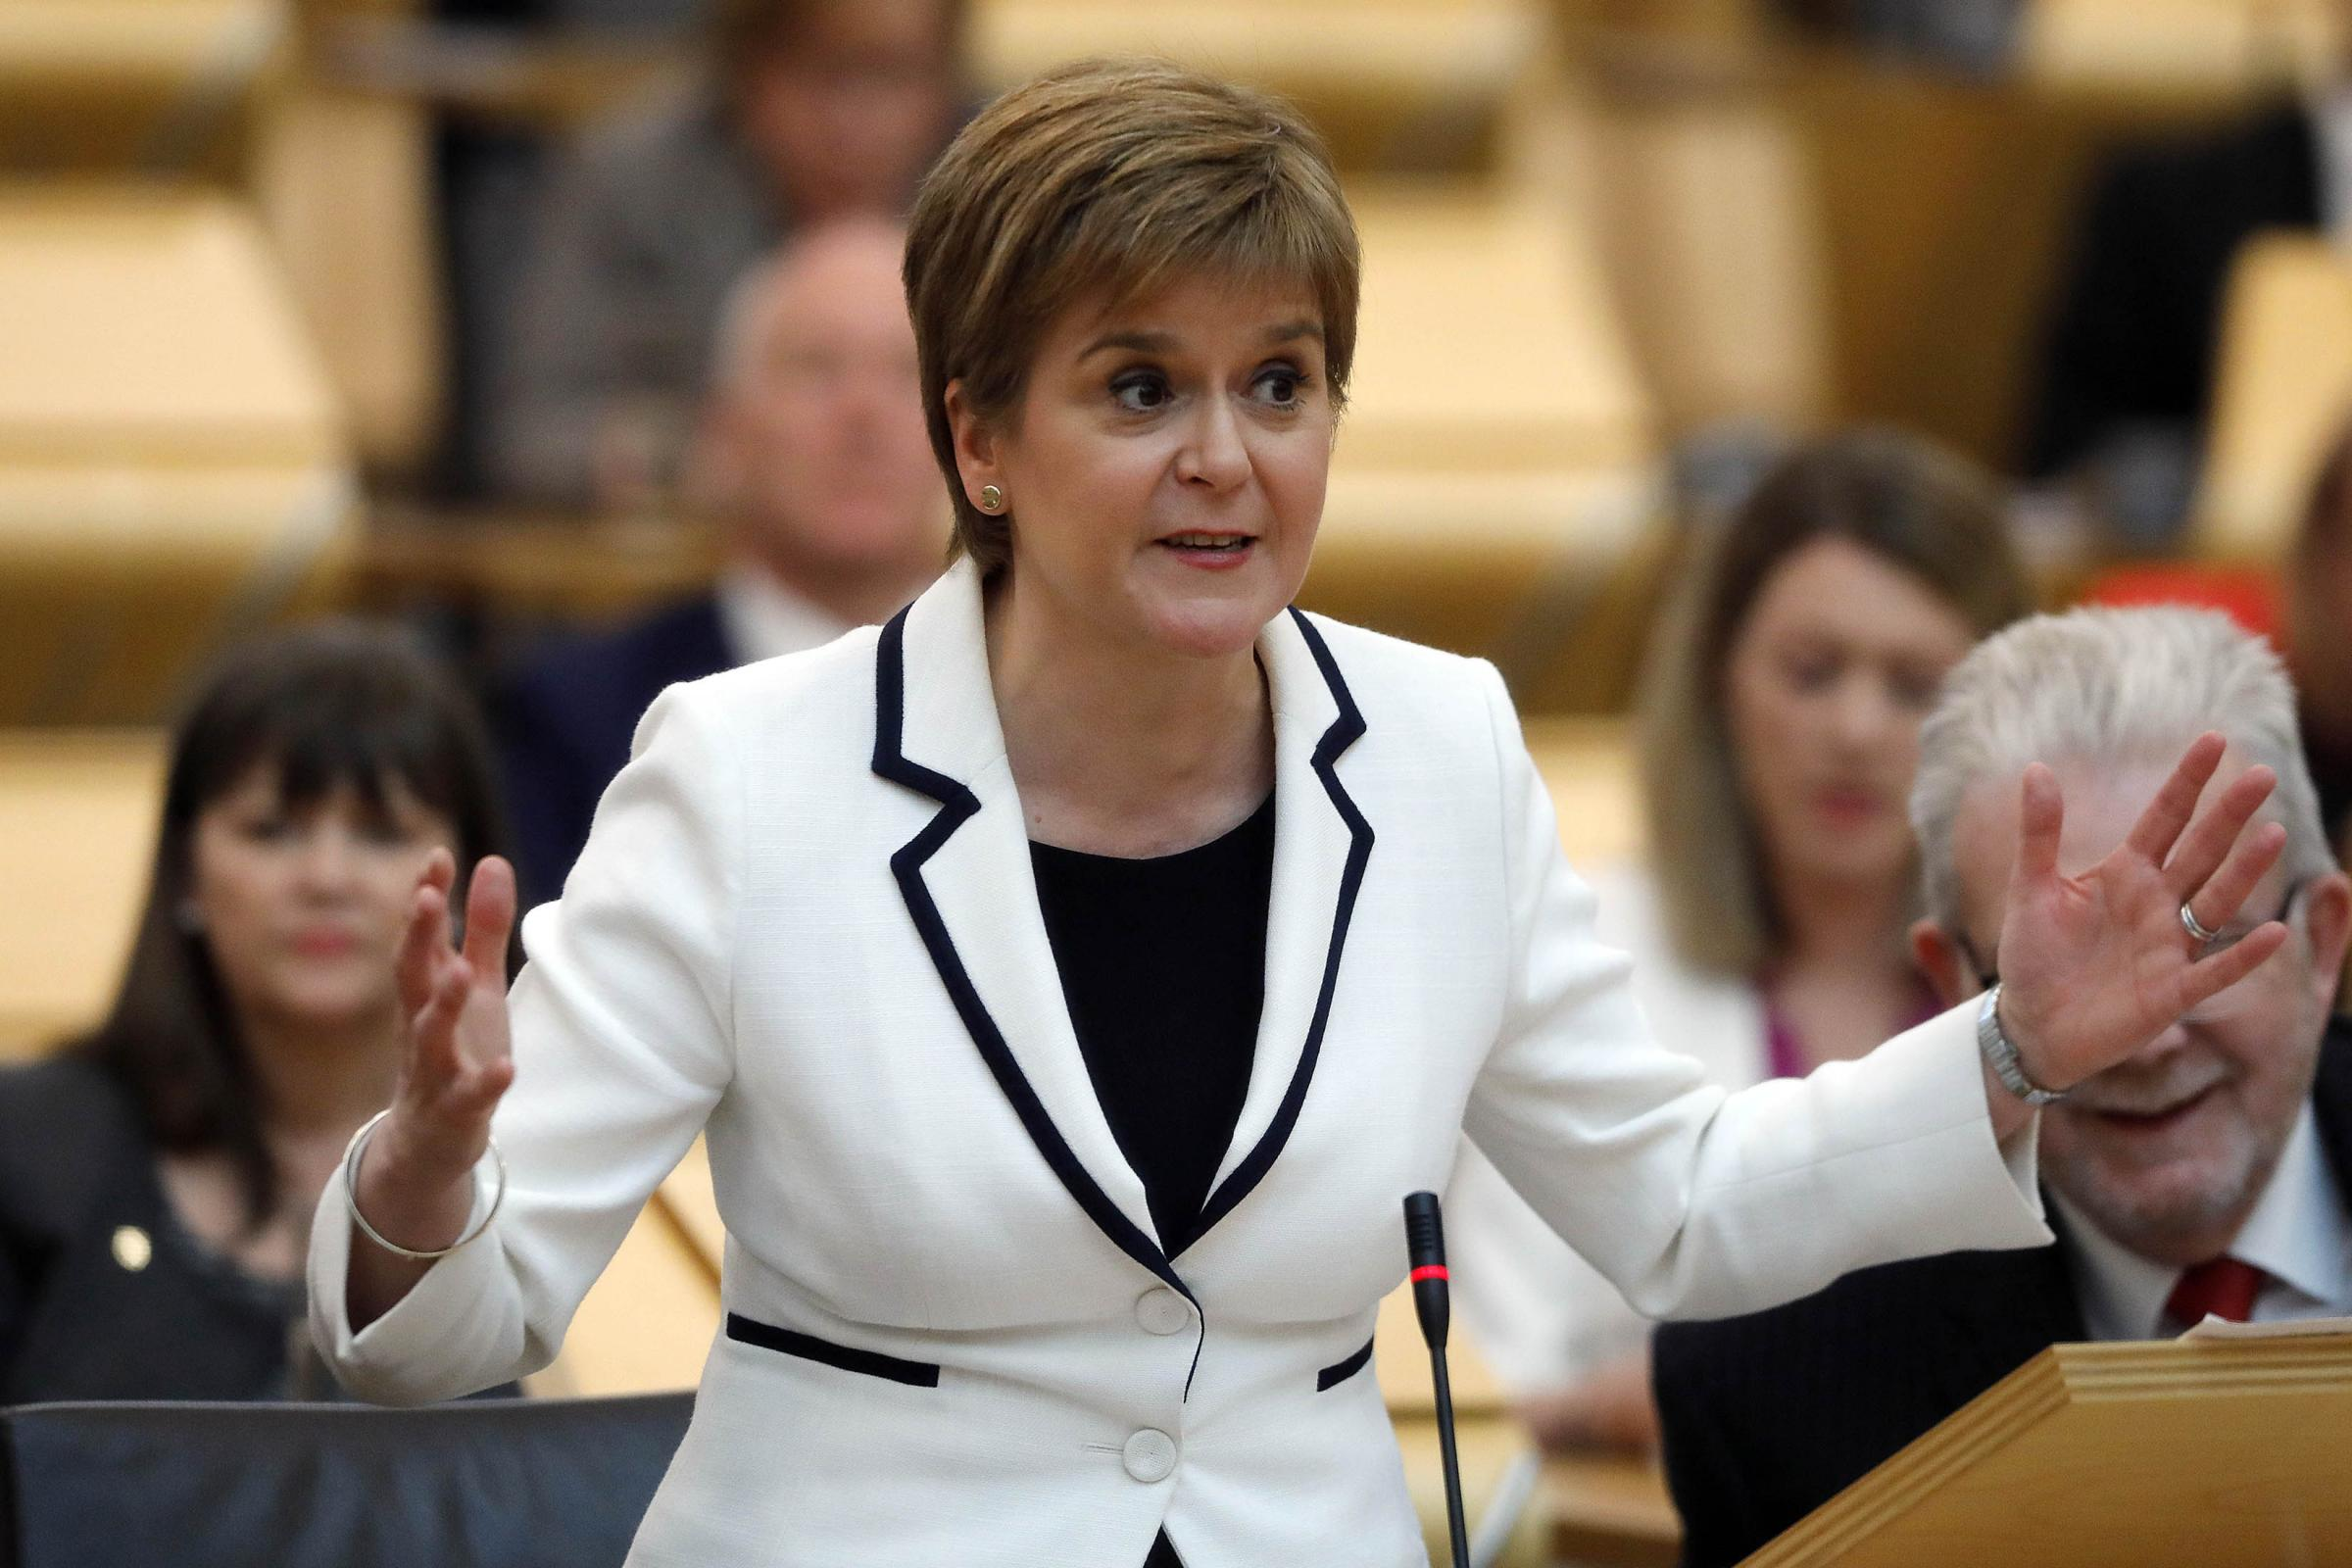 Nicola Sturgeon hits back at Ruth Davidson with the perfect tweet